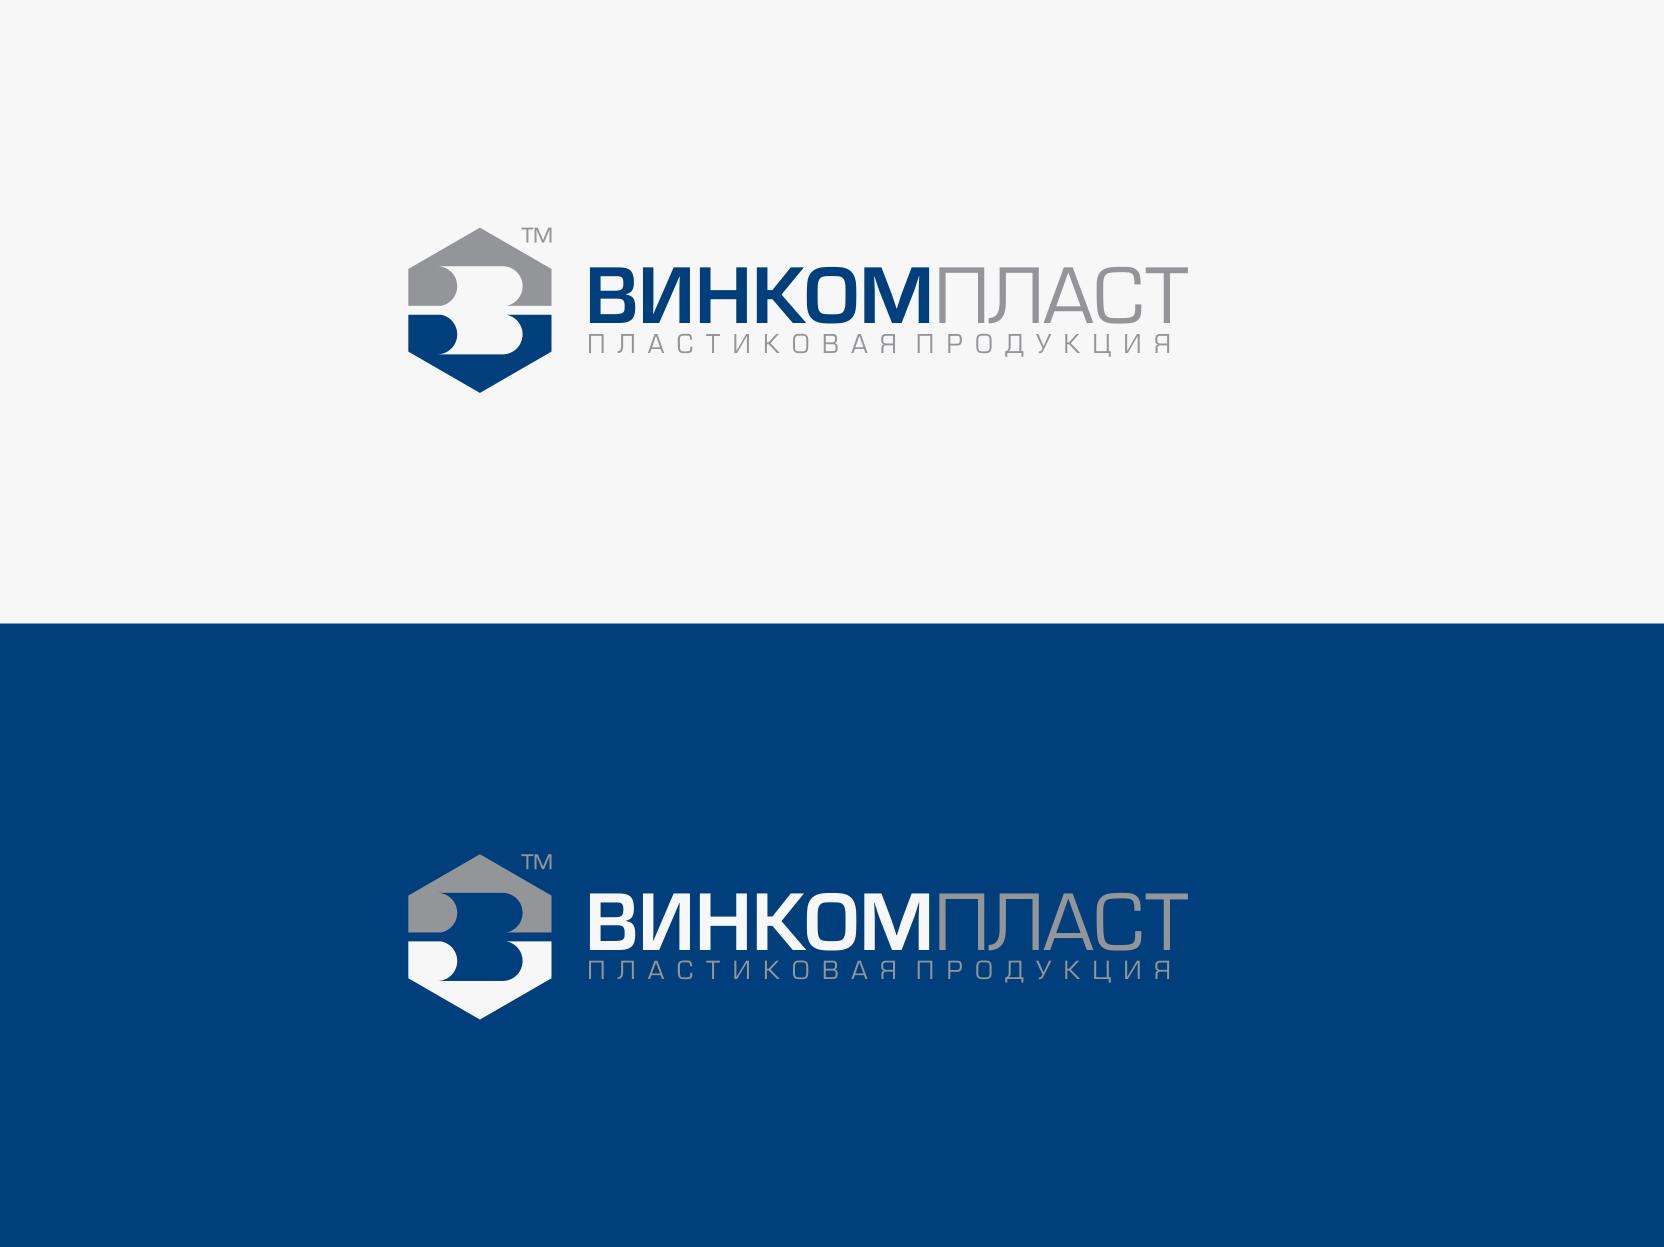 Логотип, фавикон и визитка для компании Винком Пласт  фото f_3215c363a5792f16.png